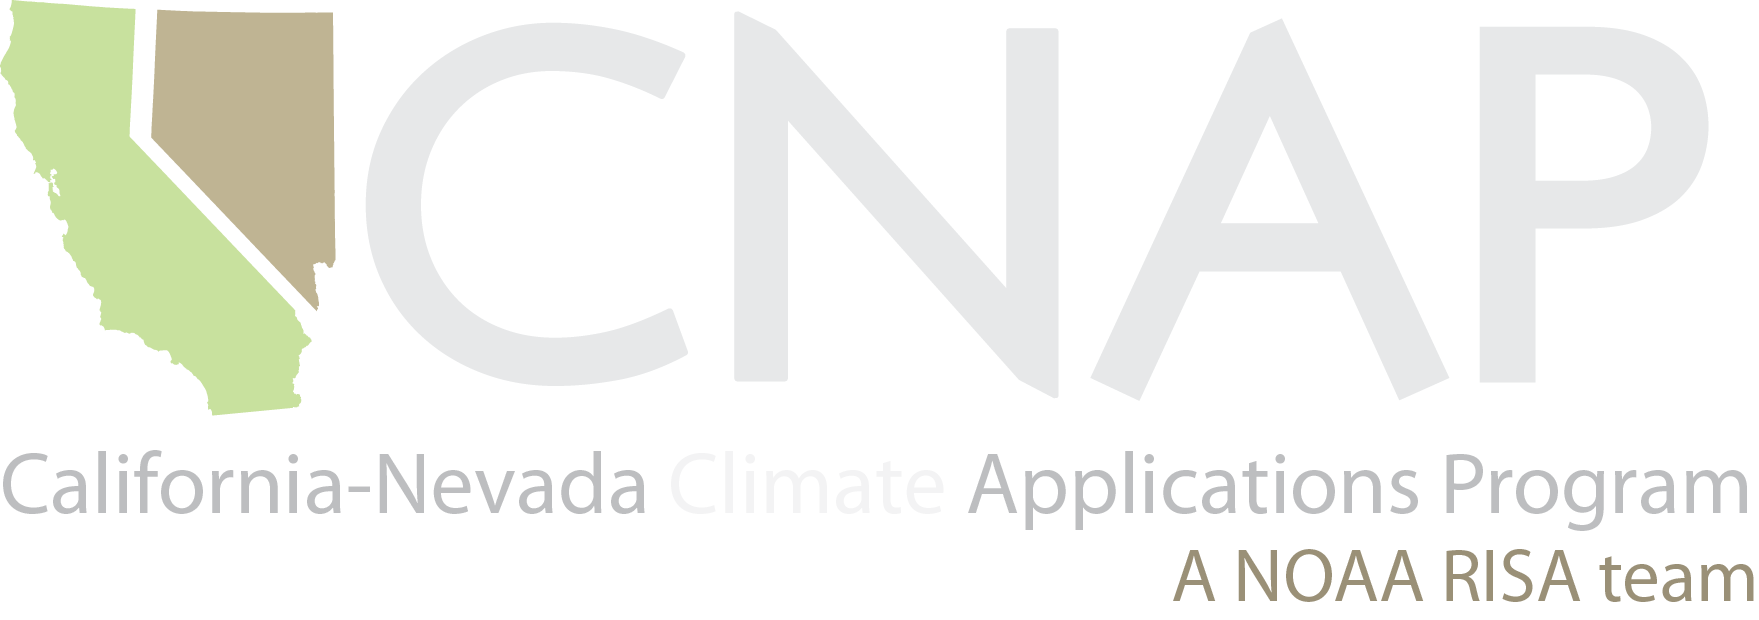 California-Nevada Climate Applications Program